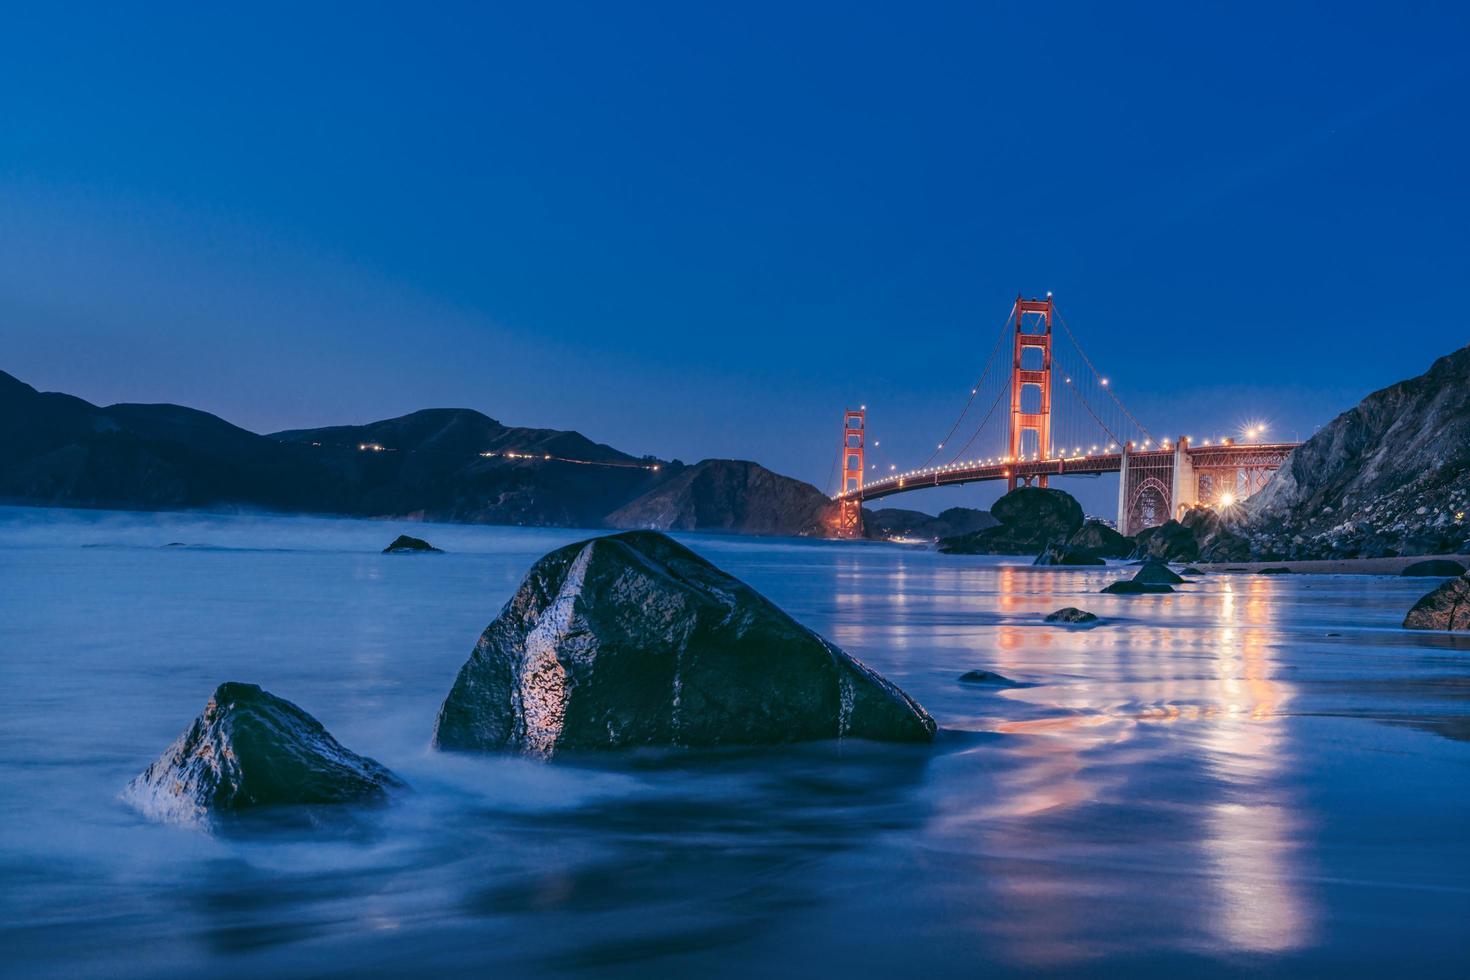 lång exponering av den gyllene porten på natten foto